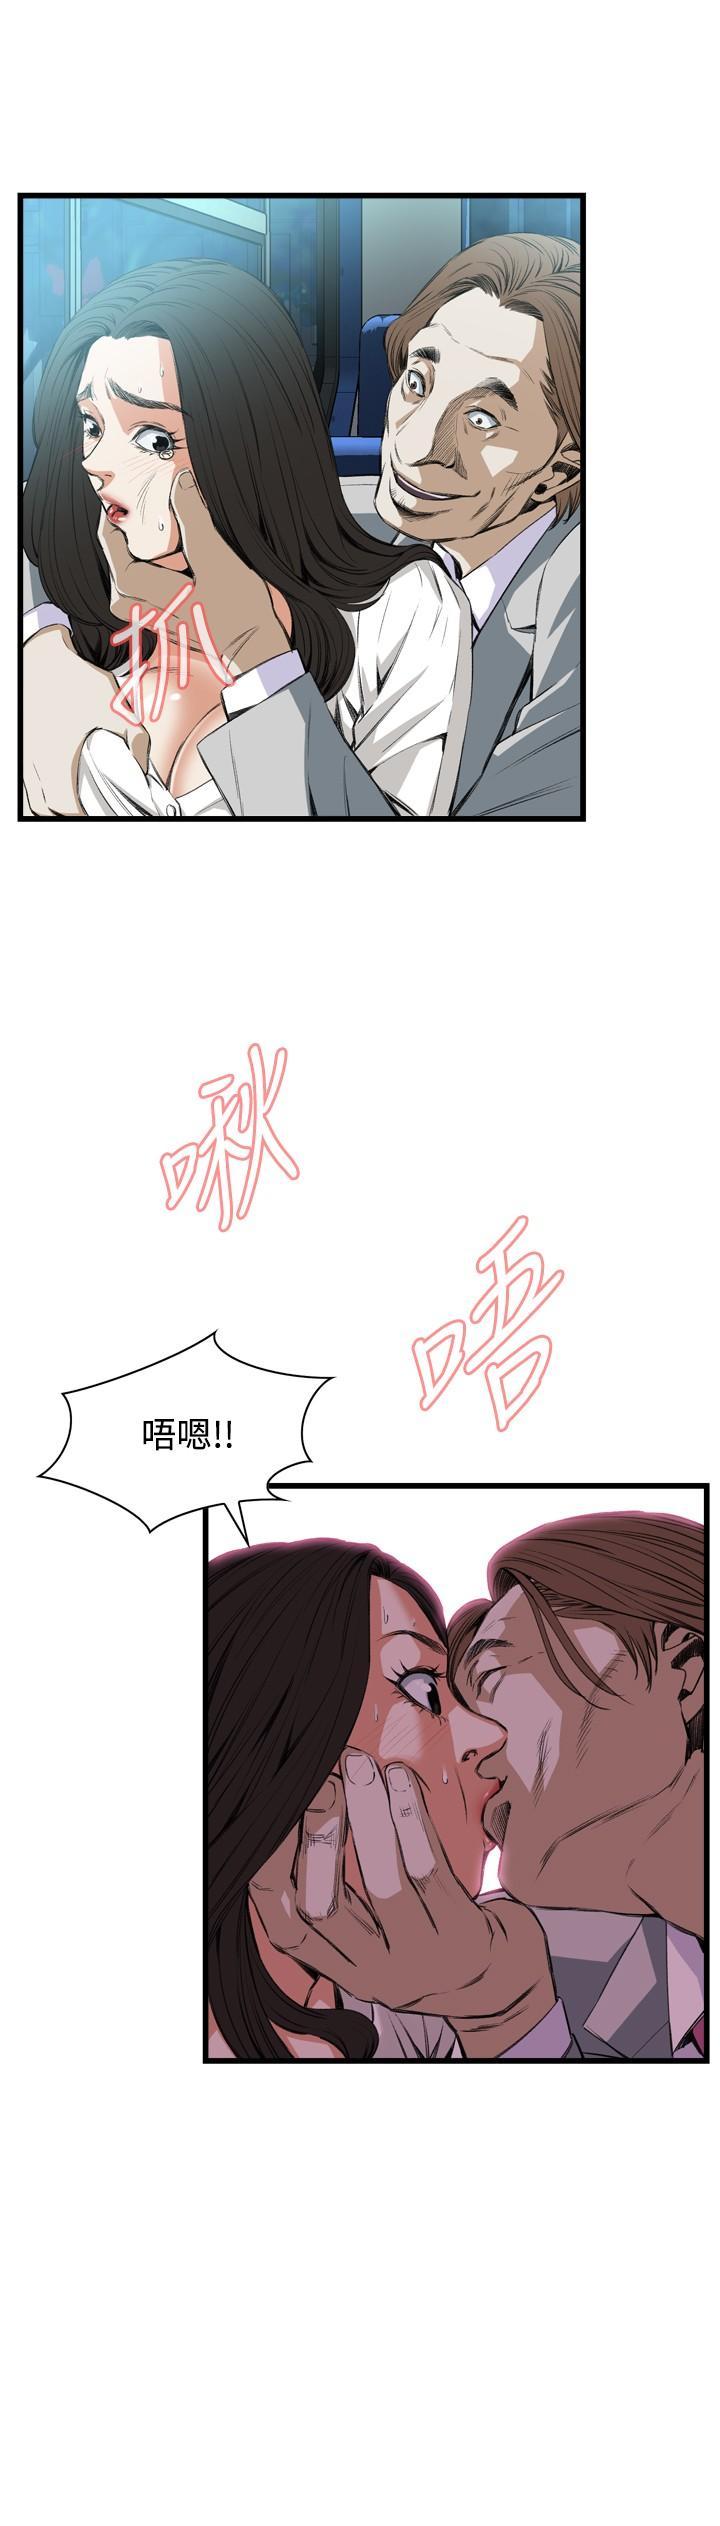 Take a Peek 偷窥 Ch.39~55 [Chinese]中文 327